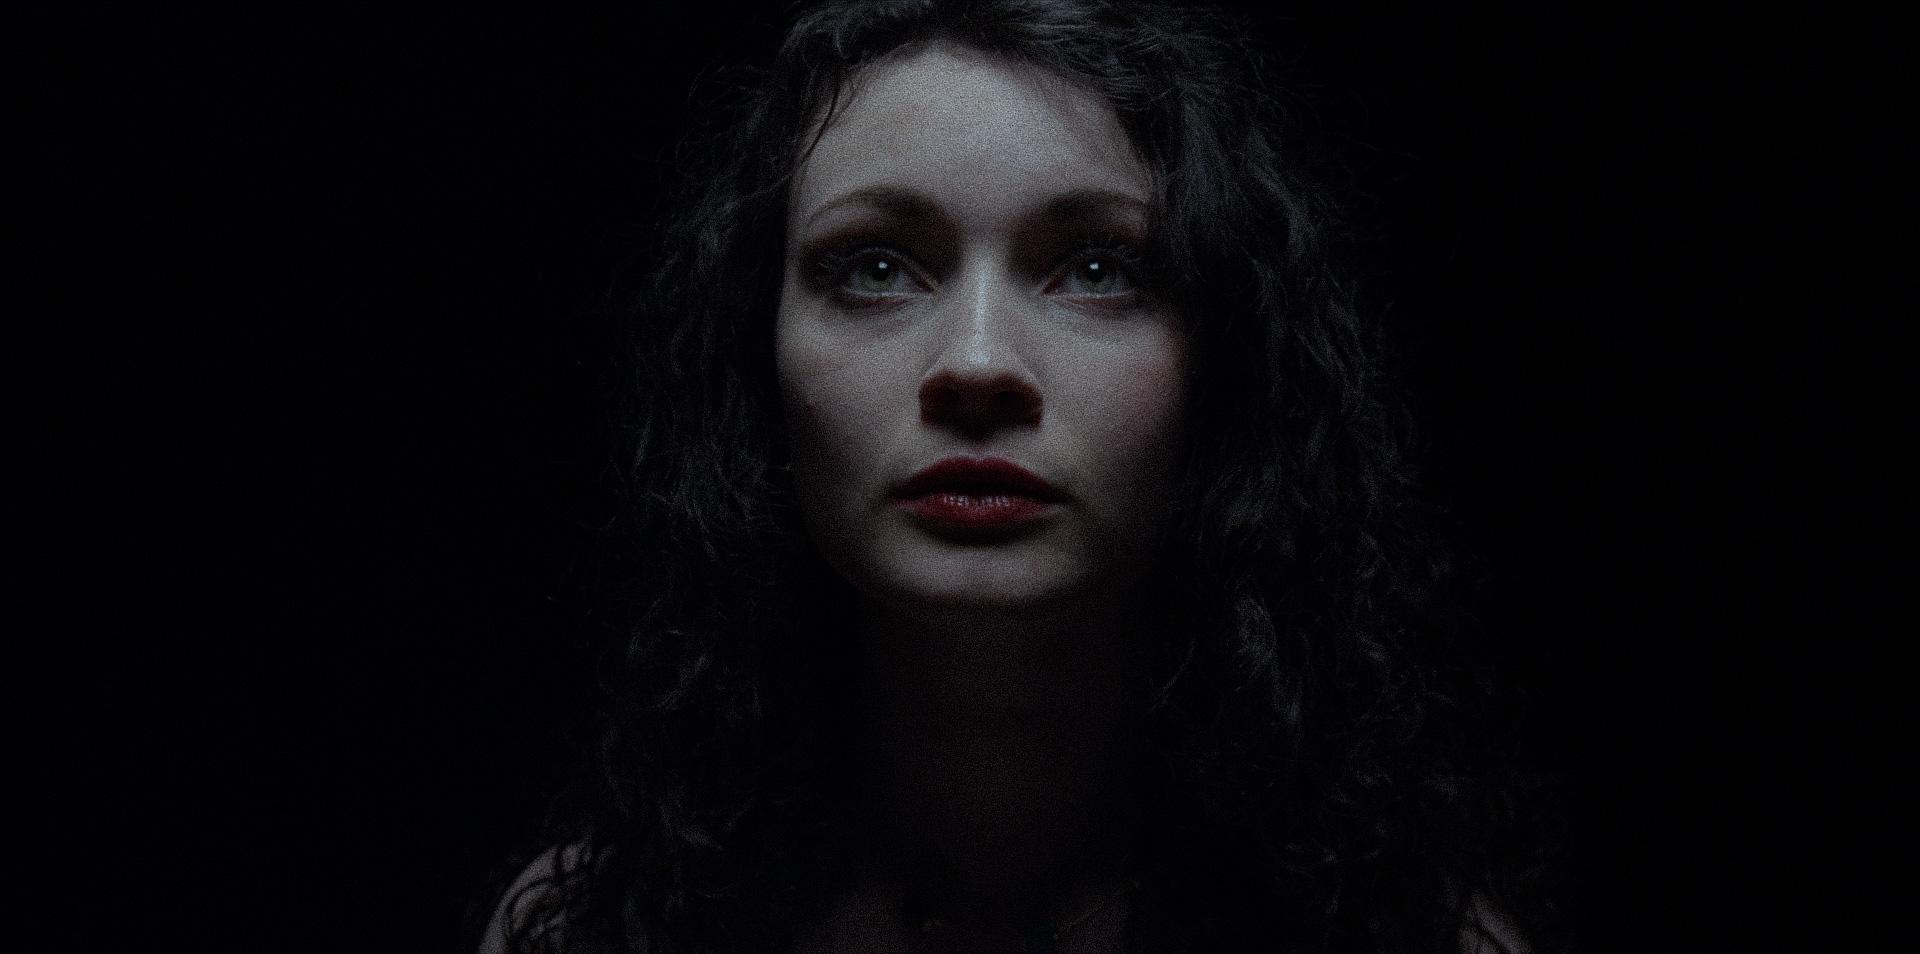 YANG | SHORT FILM  Director: Vonne Patiag  Director of Photography: Dimitri Zaunders   MORE